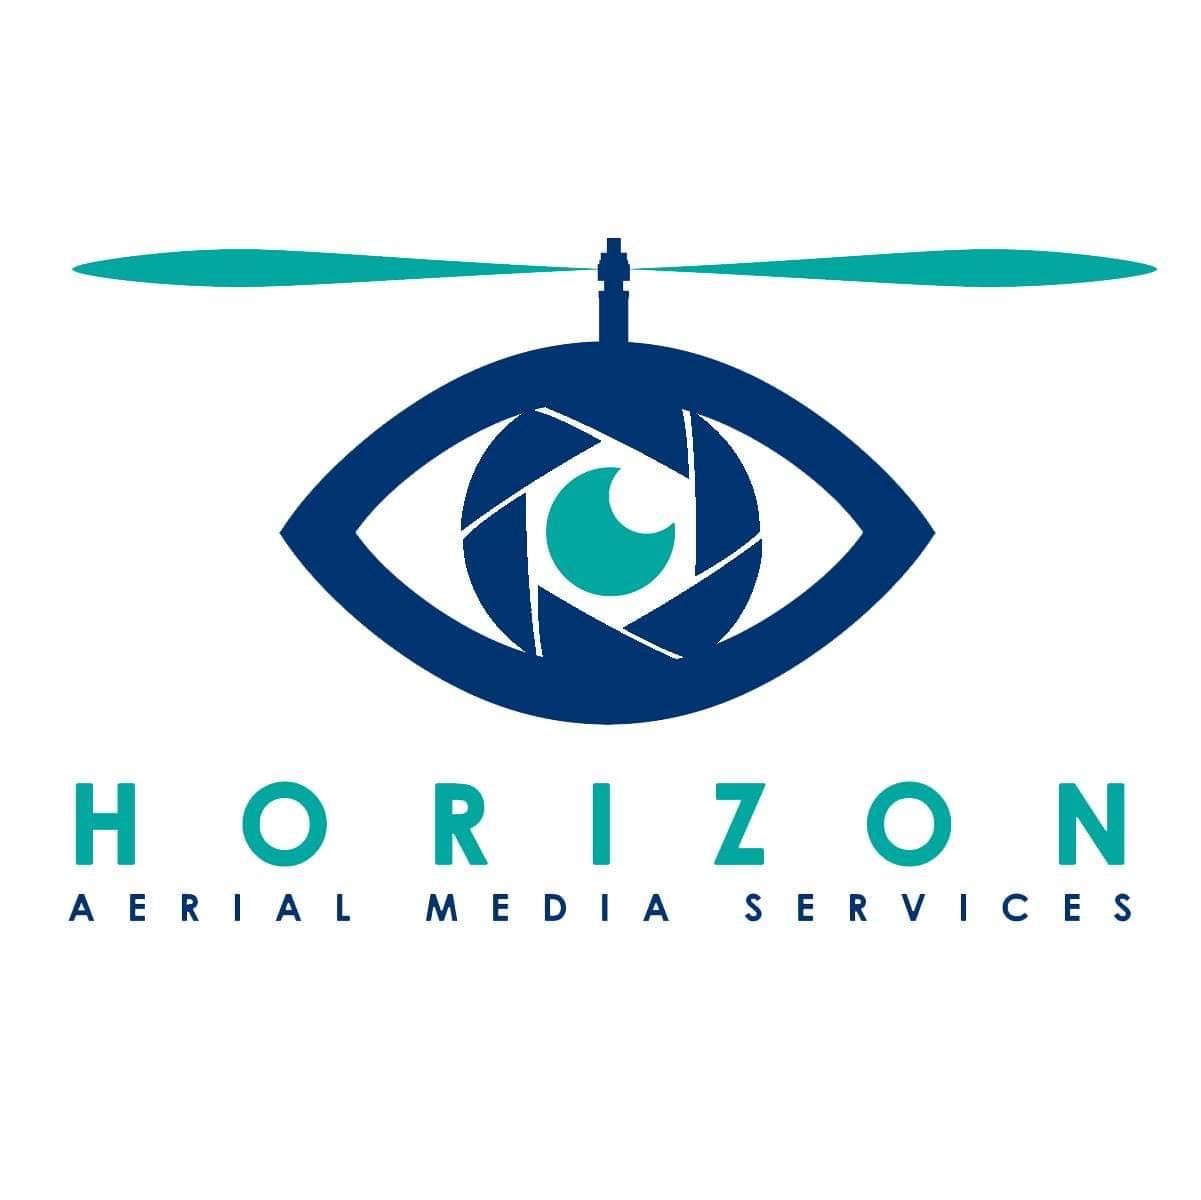 Horizon Aerial Media Services logo